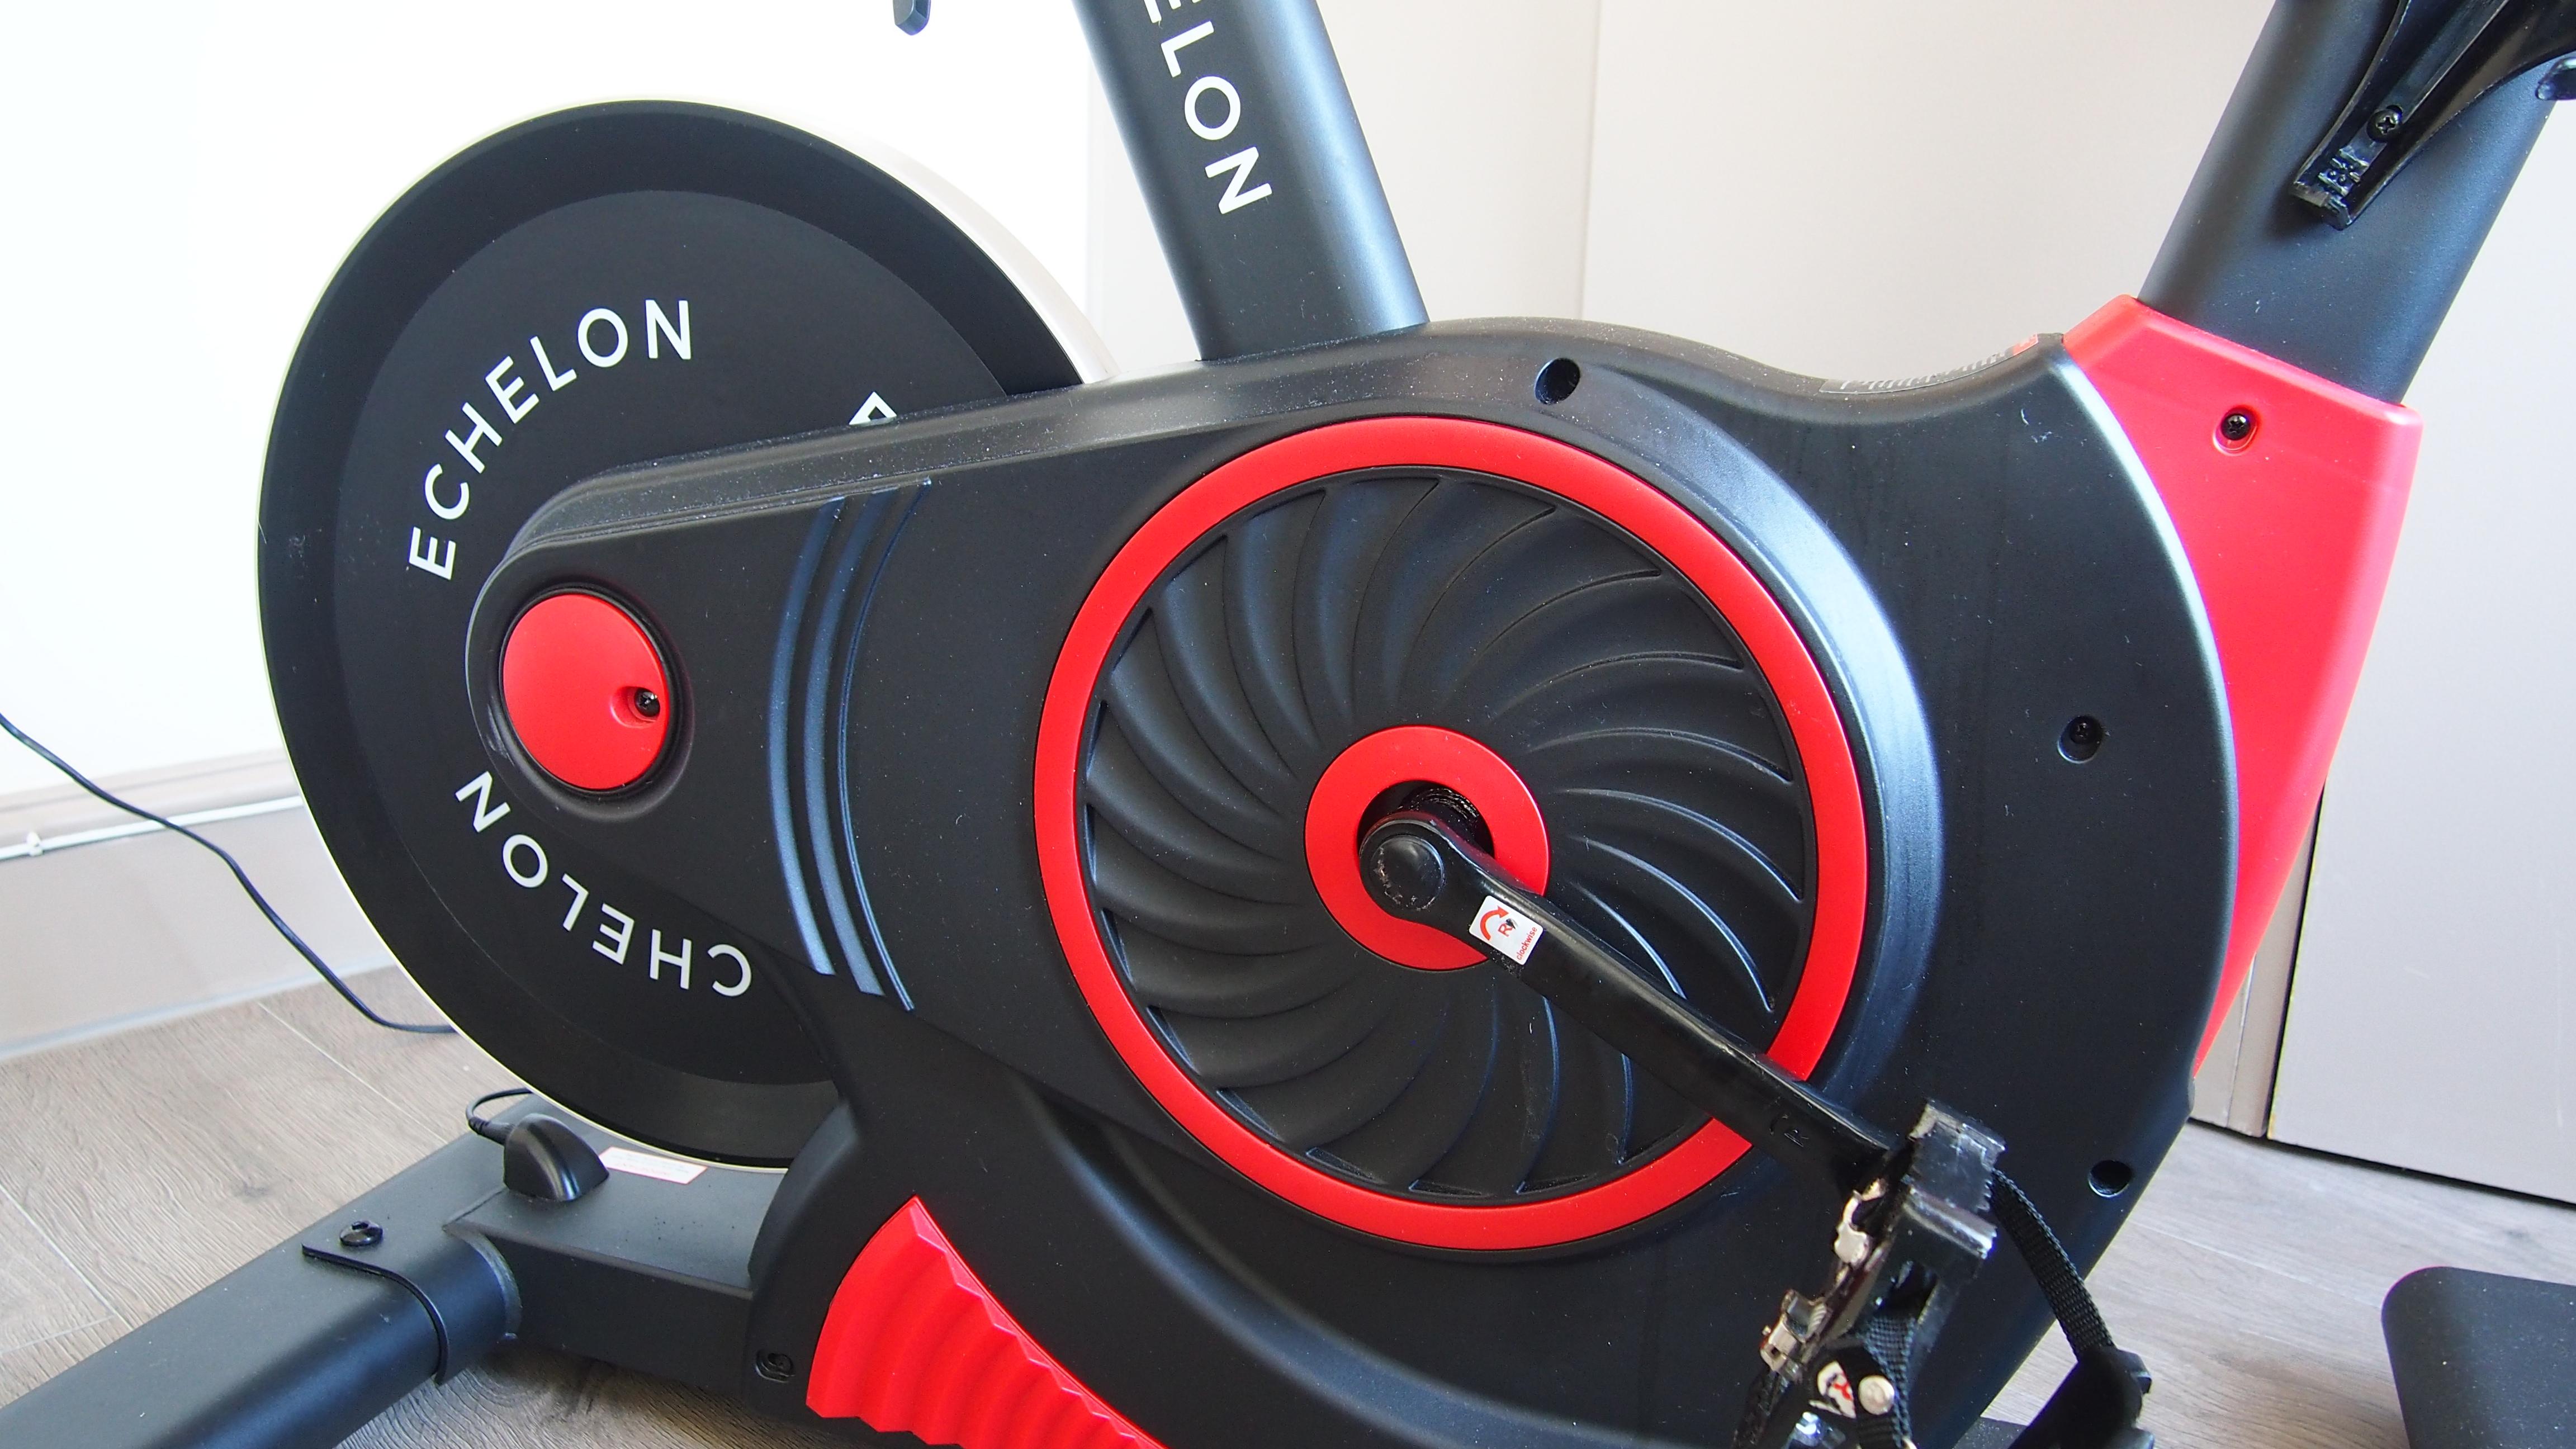 Echelon Smart Connect EX3 Max Bike